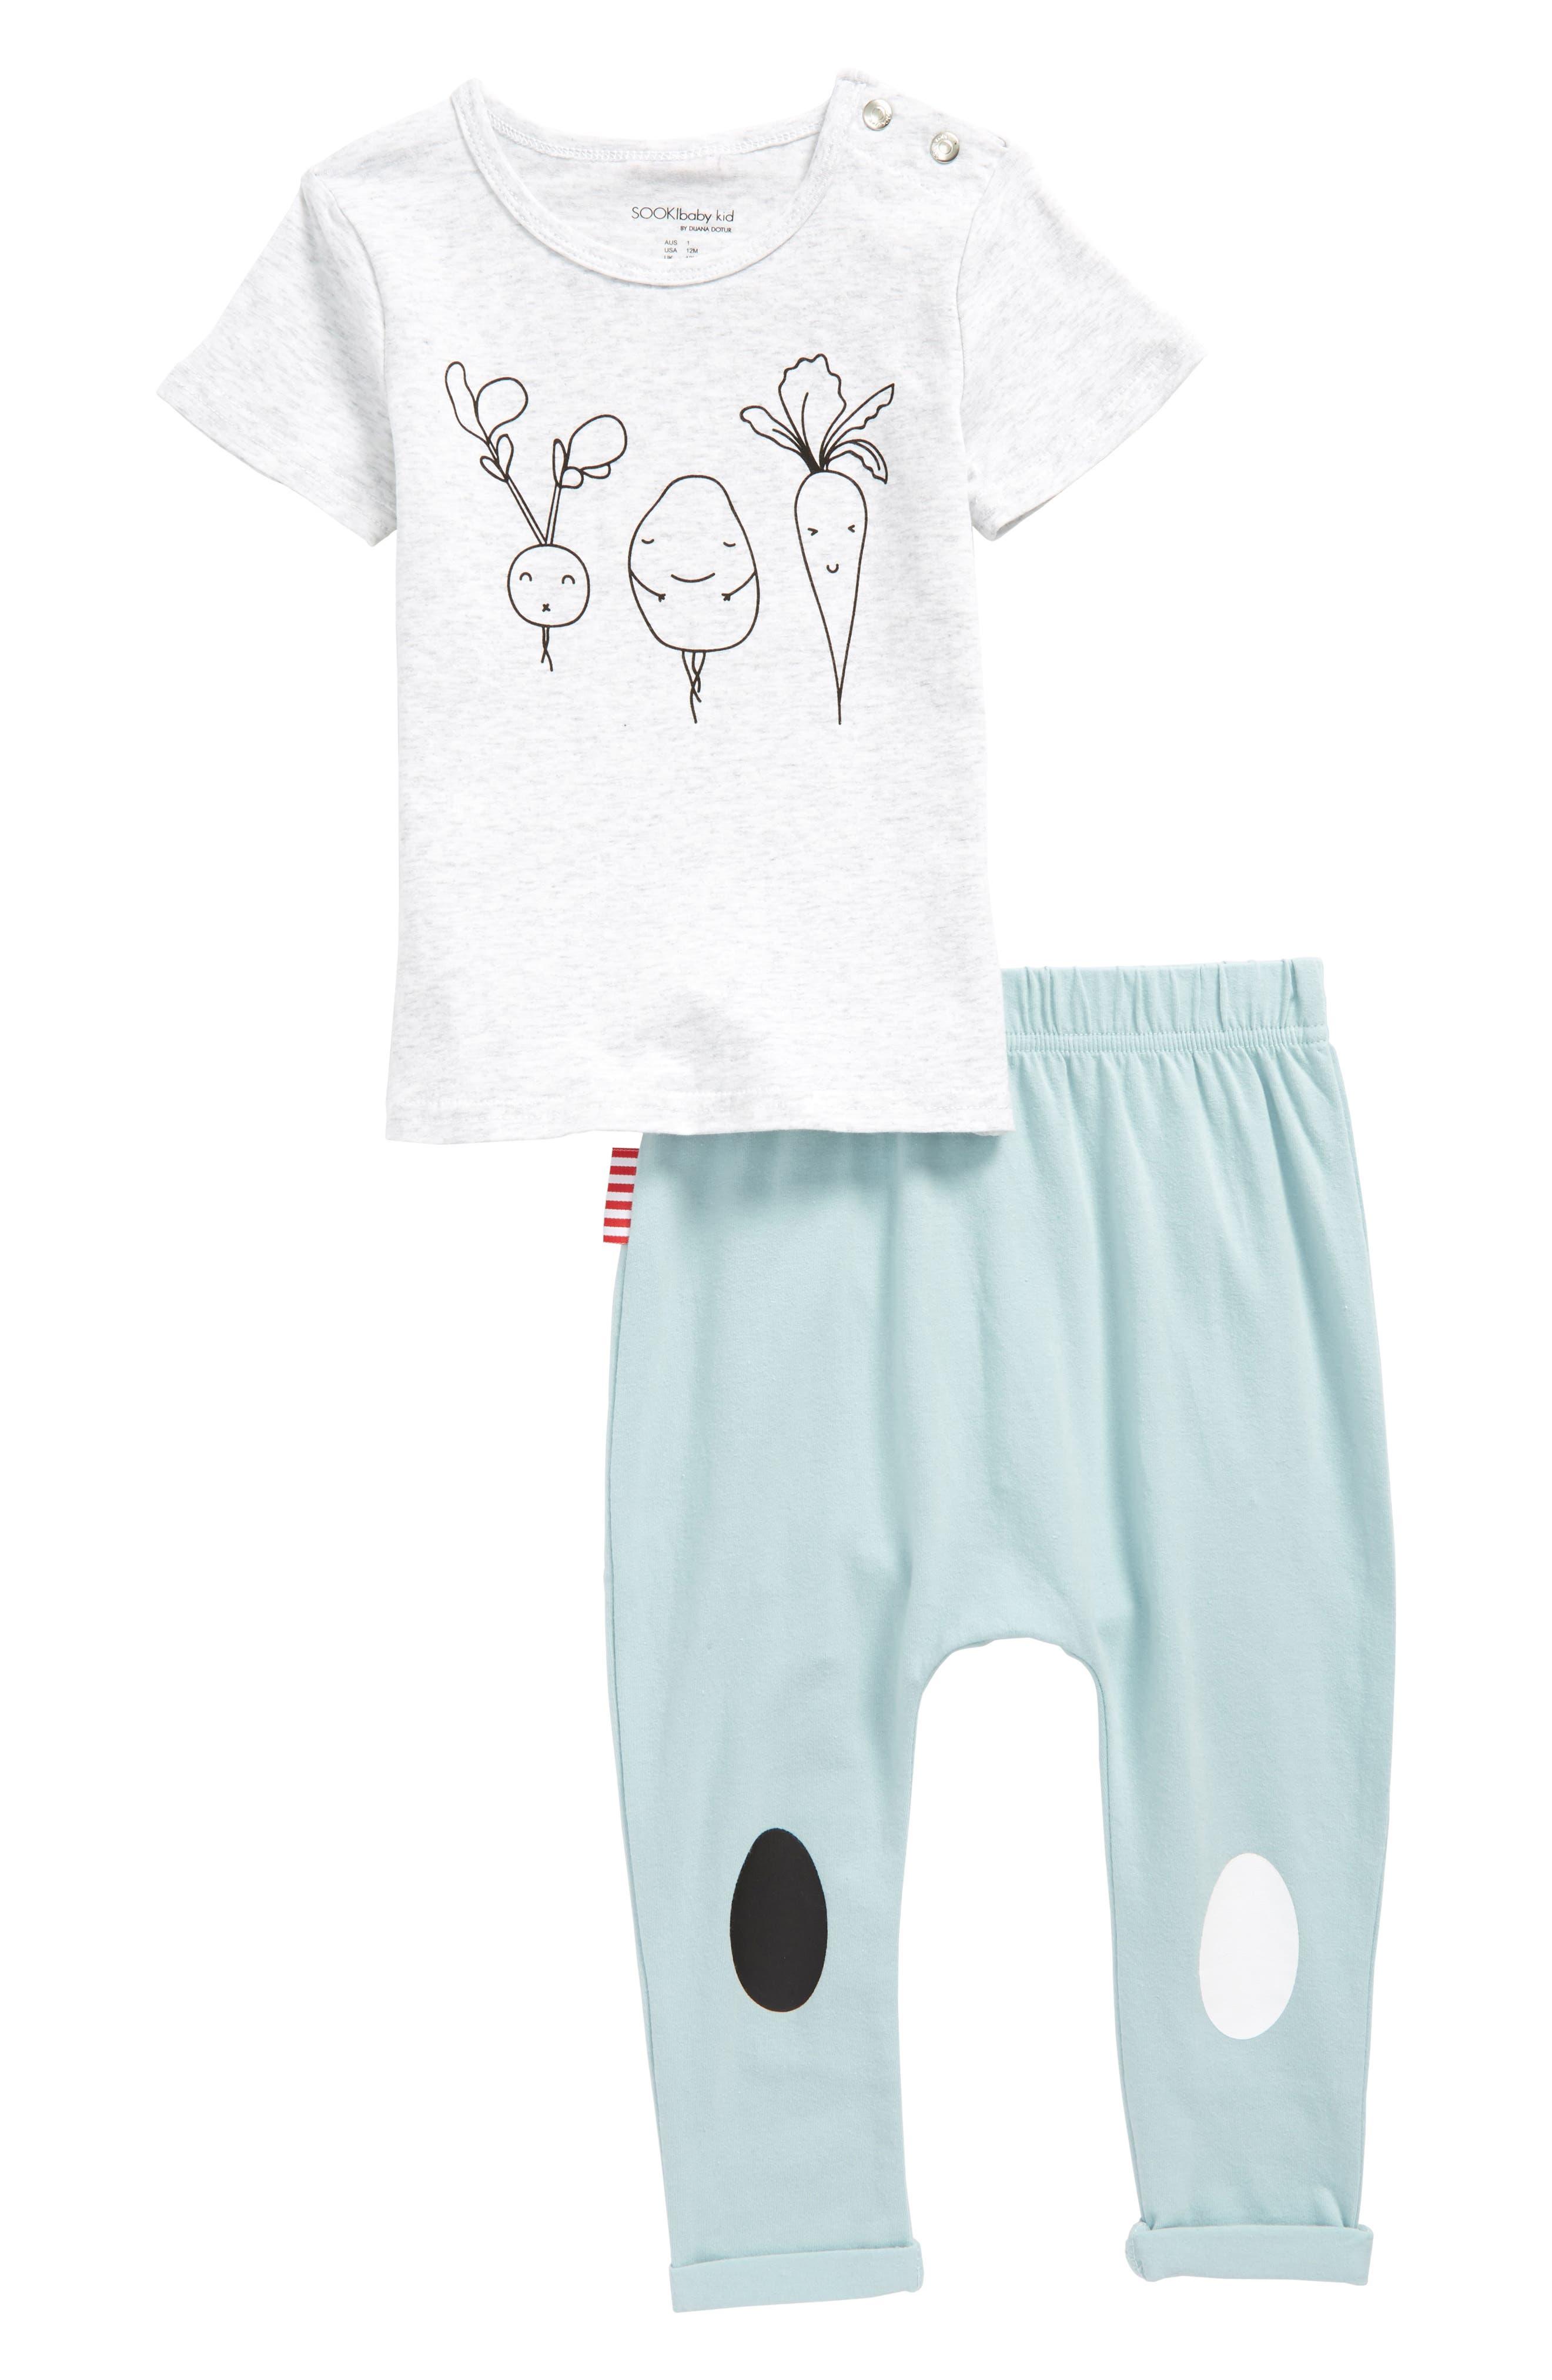 SOOKIbaby Brunch T-Shirt & Pants Set (Baby & Toddler)